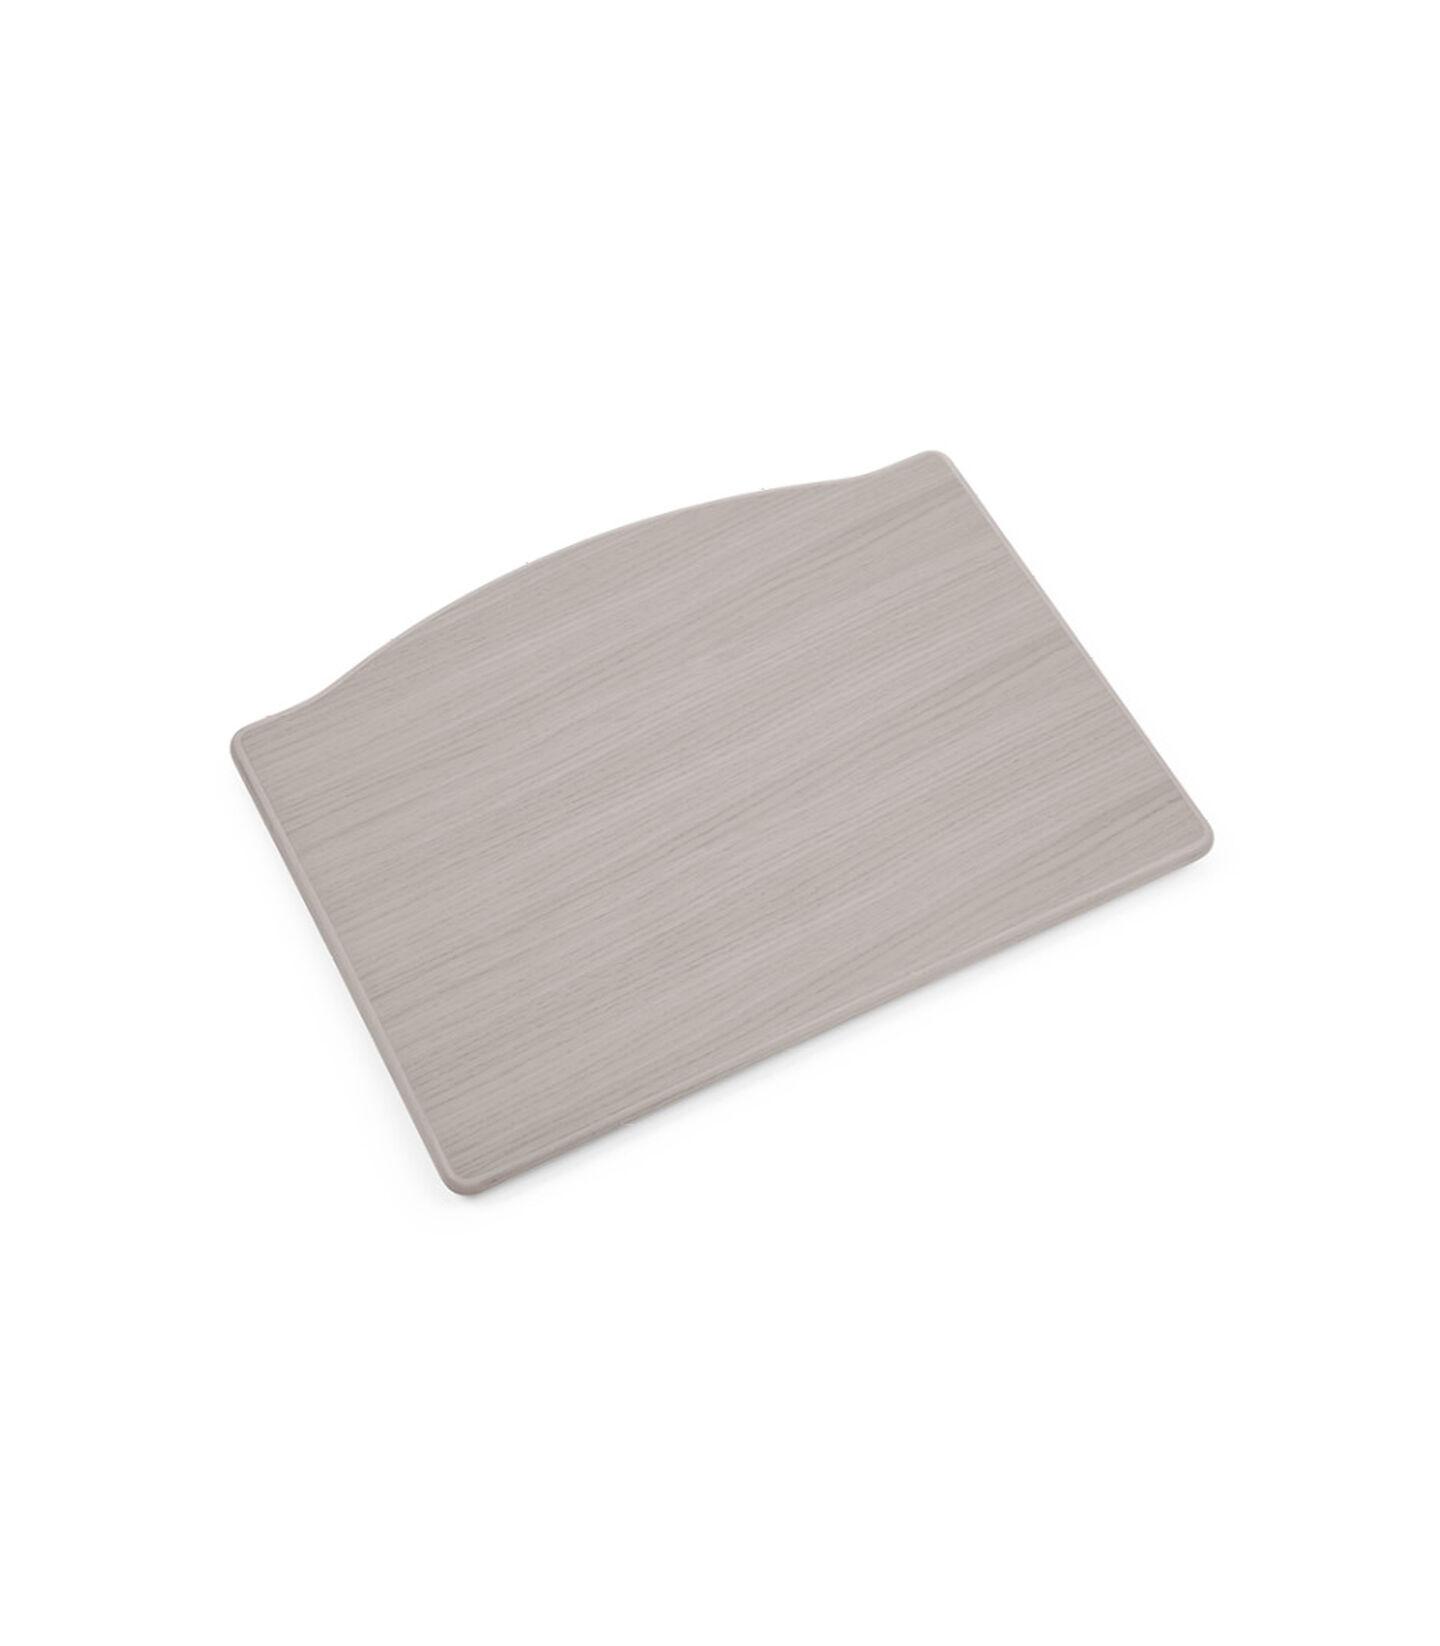 Tripp Trapp® Footplate Oak Greywash, Rovere Grigio Acquarello, mainview